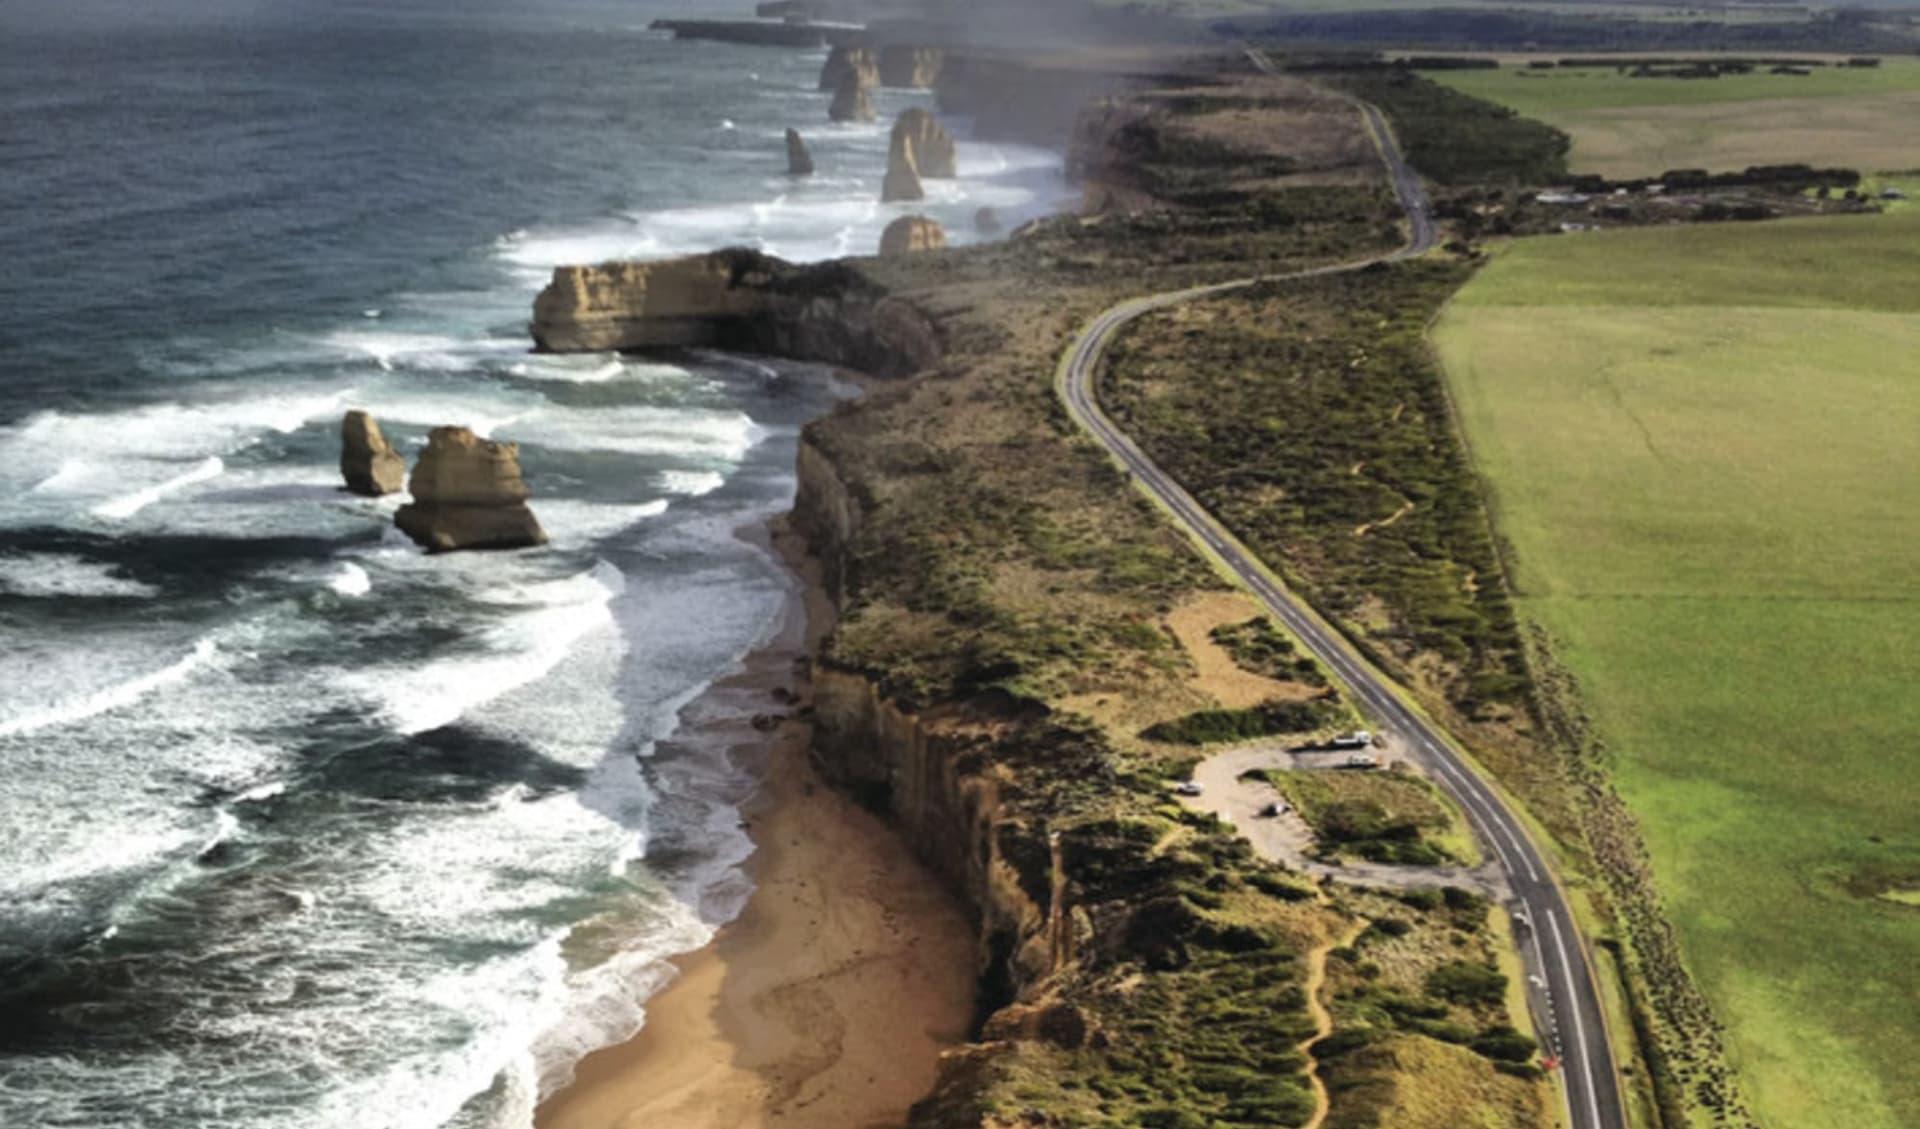 Magic Beauty ab Melbourne: Great Ocean Road - 12 Apostles und Strasse